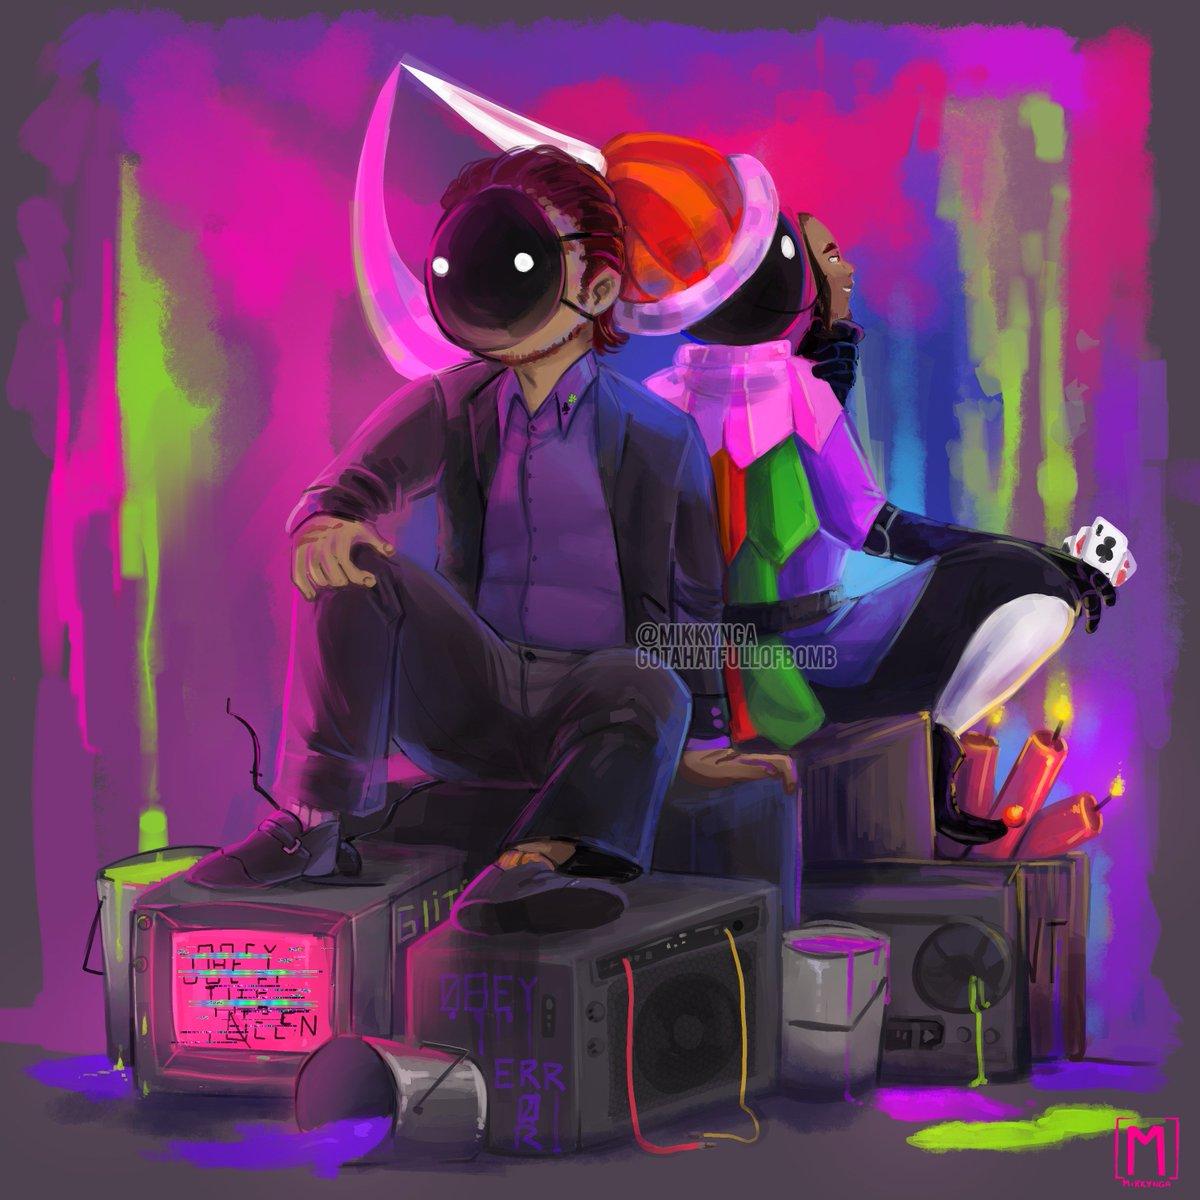 Art for a rp blog i run.  A bunch of feelings my dude.  #homestuck #intermission #clubsdeuce #cd #hs #clipstudiopaint #painting #digitalart #fanart #hsfanart #homestuckfanart #illustration #purple #colors  @ArtePorDoquier_  @Dibujnautas  @ConoceArtistas<br>http://pic.twitter.com/p70FCRmpW7